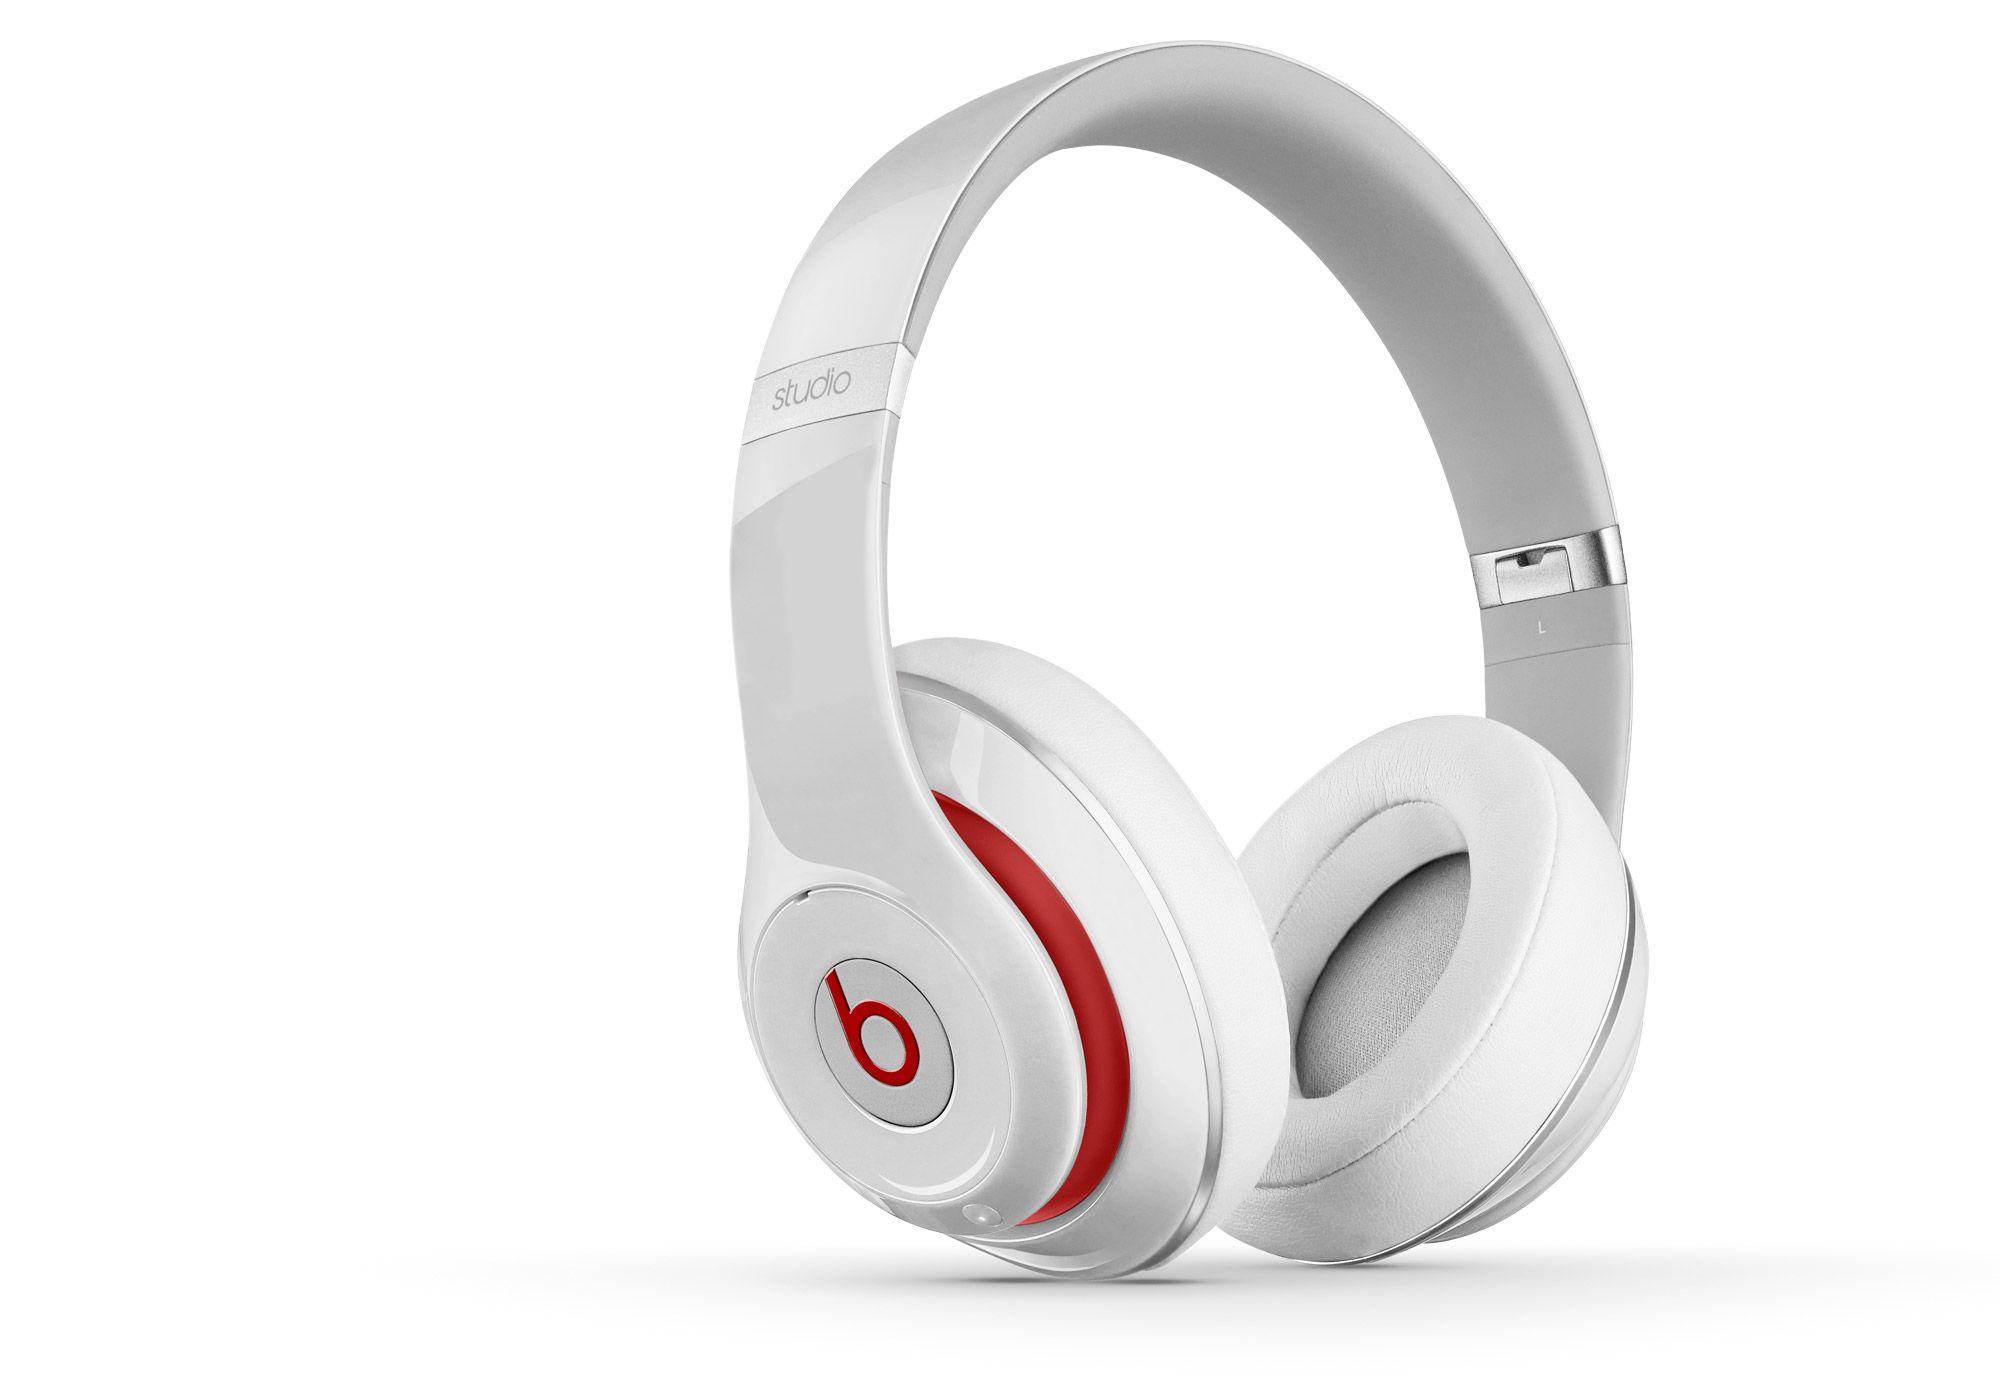 Beats By Dr. Dre Studio Wireless Over-Ear-Kopfhörer   Mit unserem Preisvergleich sparen!--219.98#sthash.xUAzX7oC.dpuf http://www.kopfhörerbluetooth.com/beats-by-dr-dre-studio-wireless-over-ear-kopfh%C3%B6rer.html